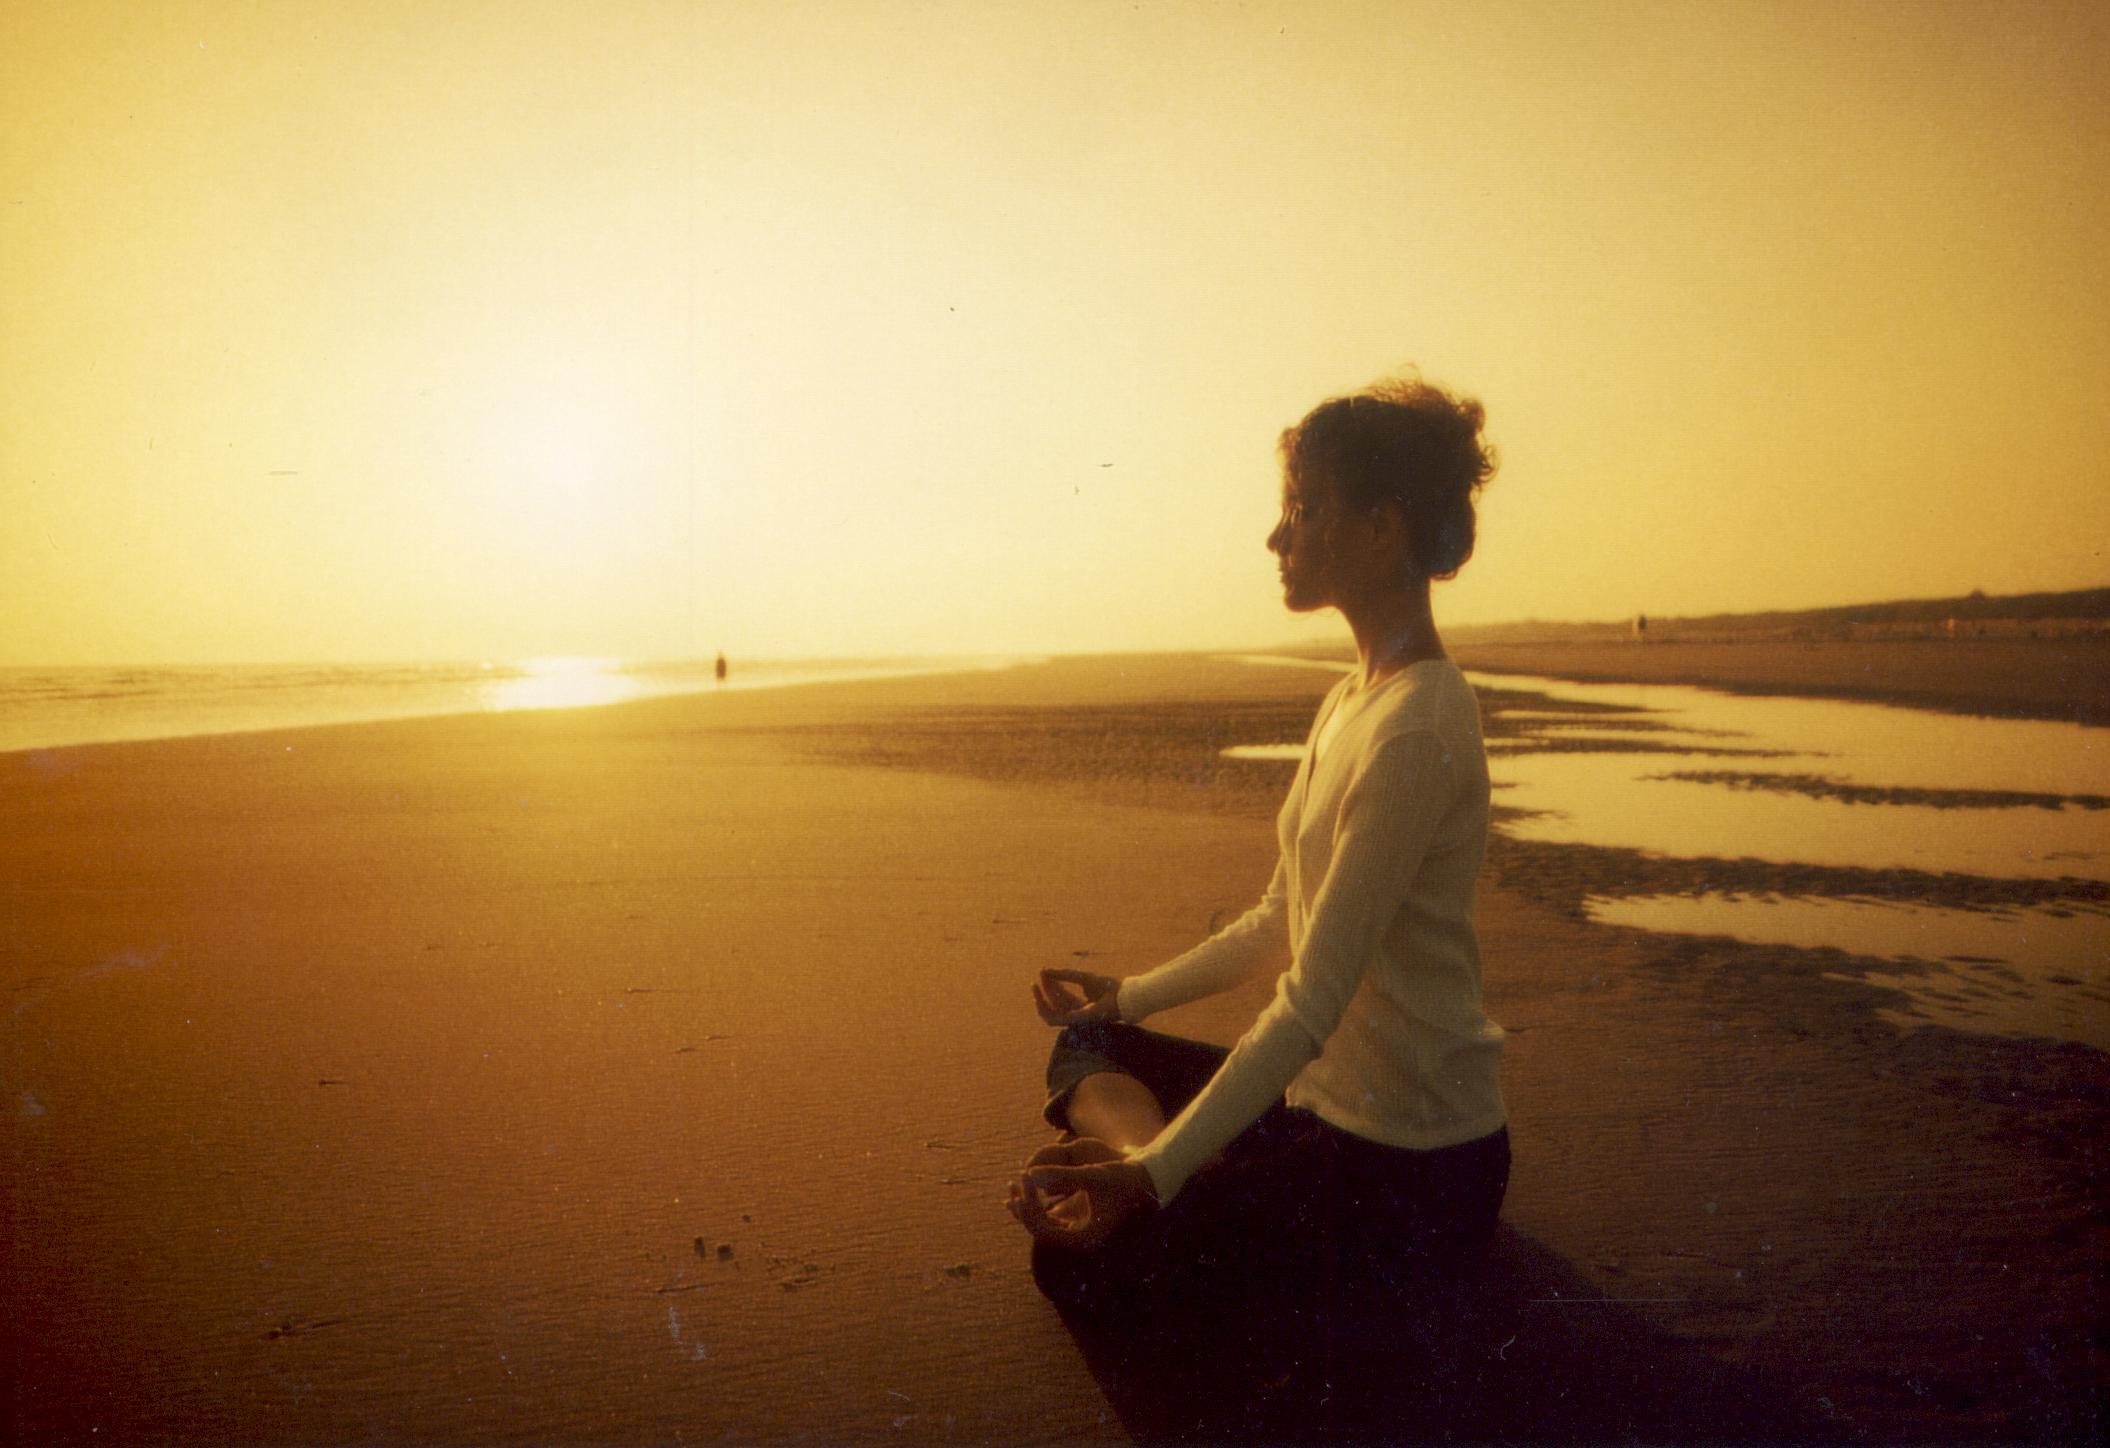 Meditation brings bodily systems back into balance. (Photo: meditateawake.com)